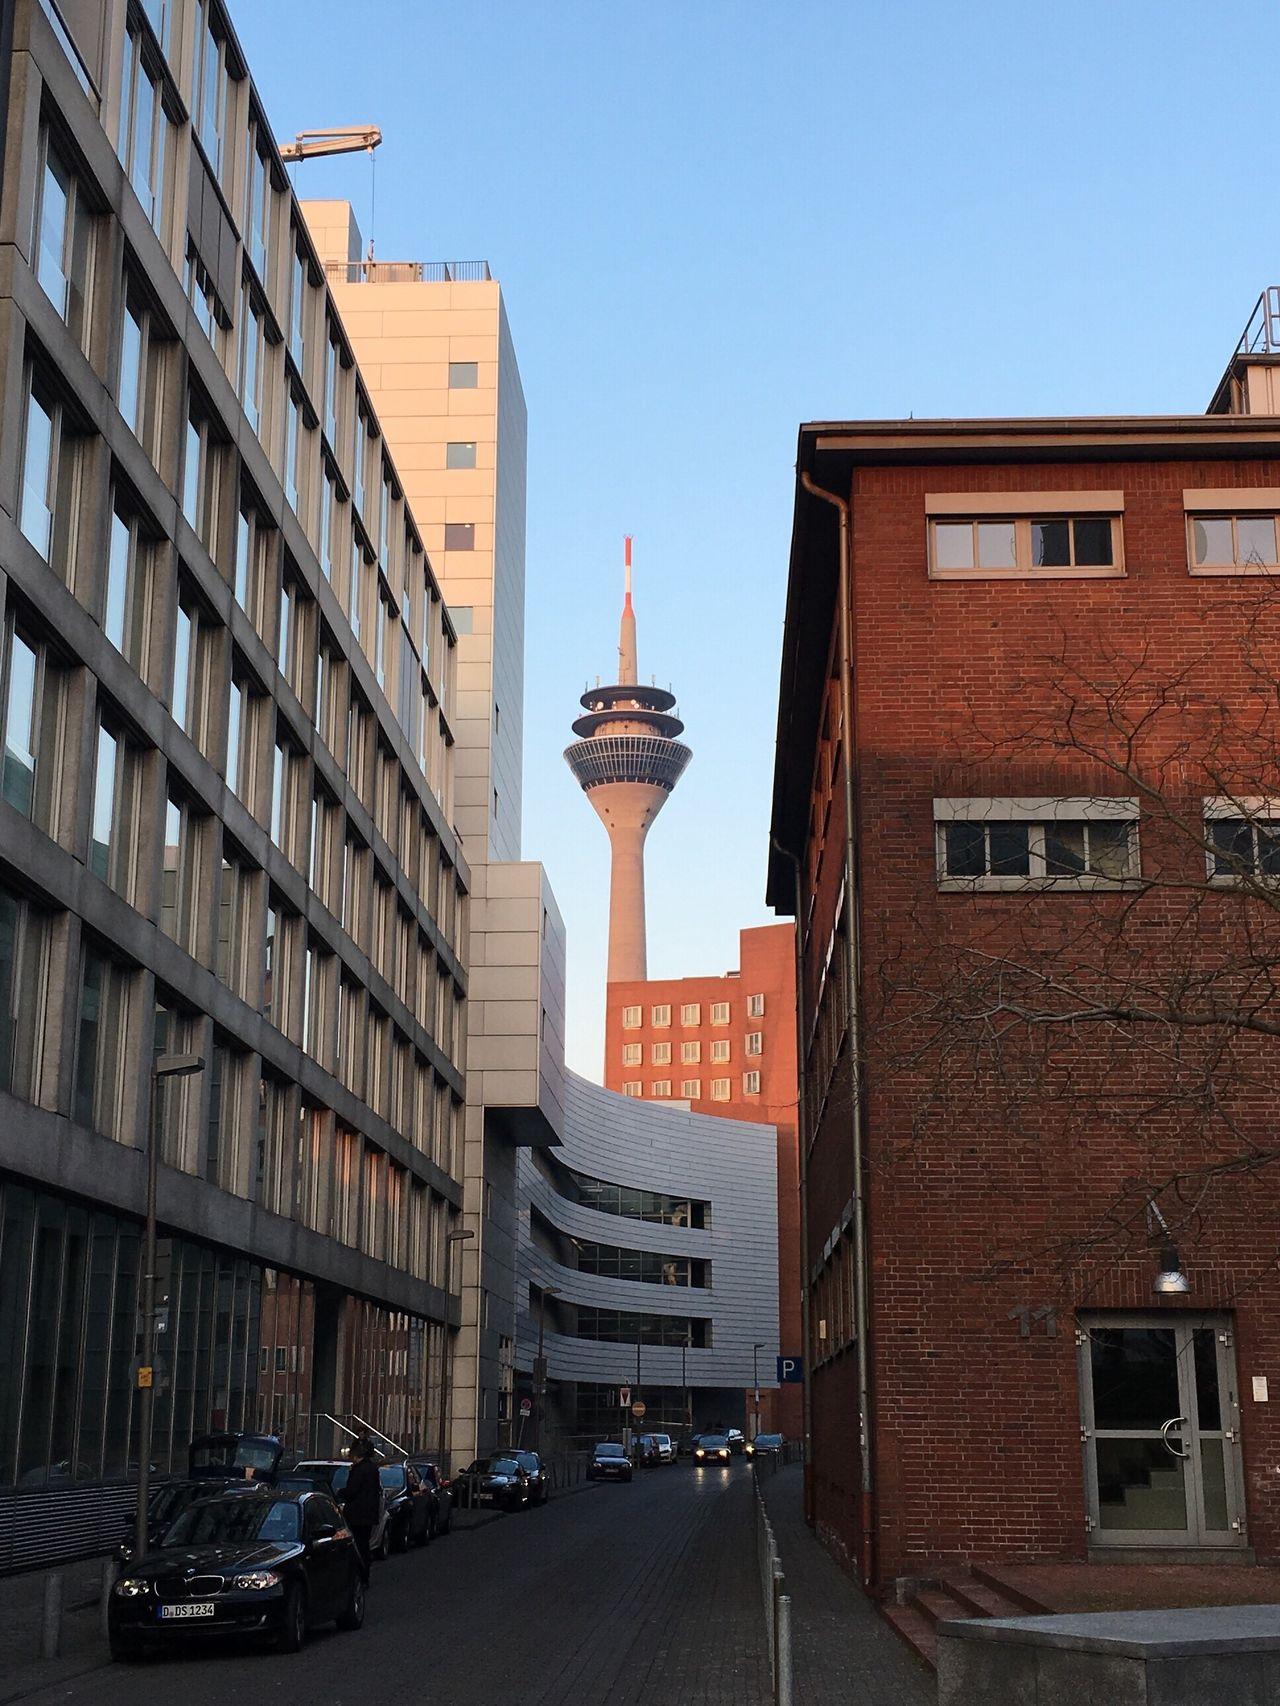 Düsseldorf Düsseldorf Medienhafen Rheinturm  Rheinturm Düsseldorf Urban Tower TV Tower Urban Canyon Streetphotography Street Canyon Street Photography EyeEm Best Shots EyeEm Best Edits EyeEm